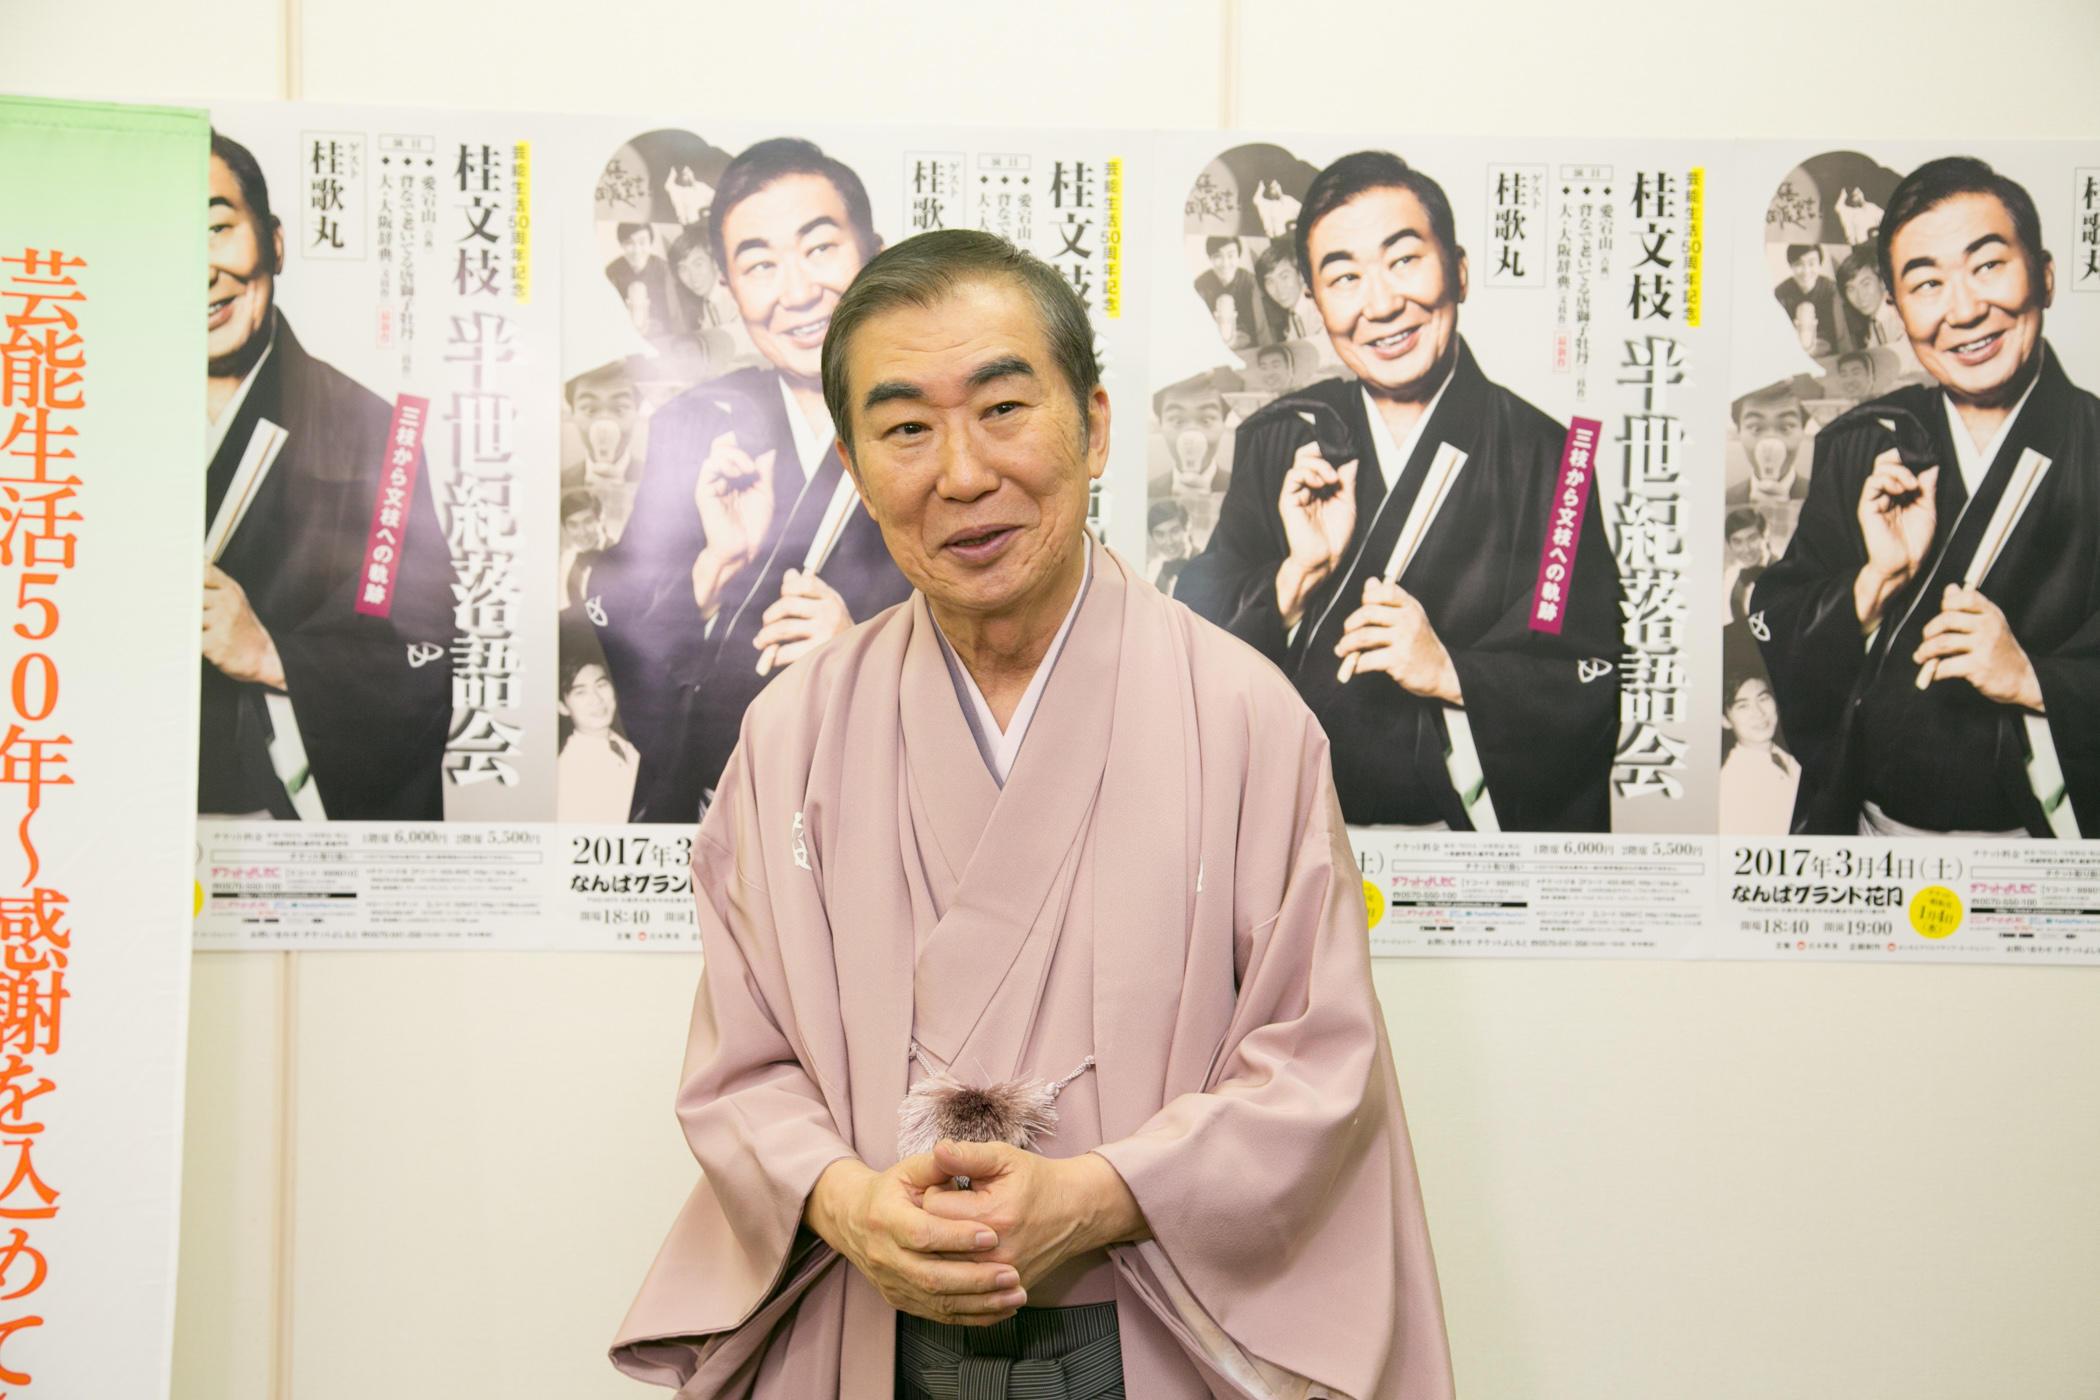 http://news.yoshimoto.co.jp/20170305012102-19099a8c89913b8cc750cc3687c44c4ae7bc96c2.jpg